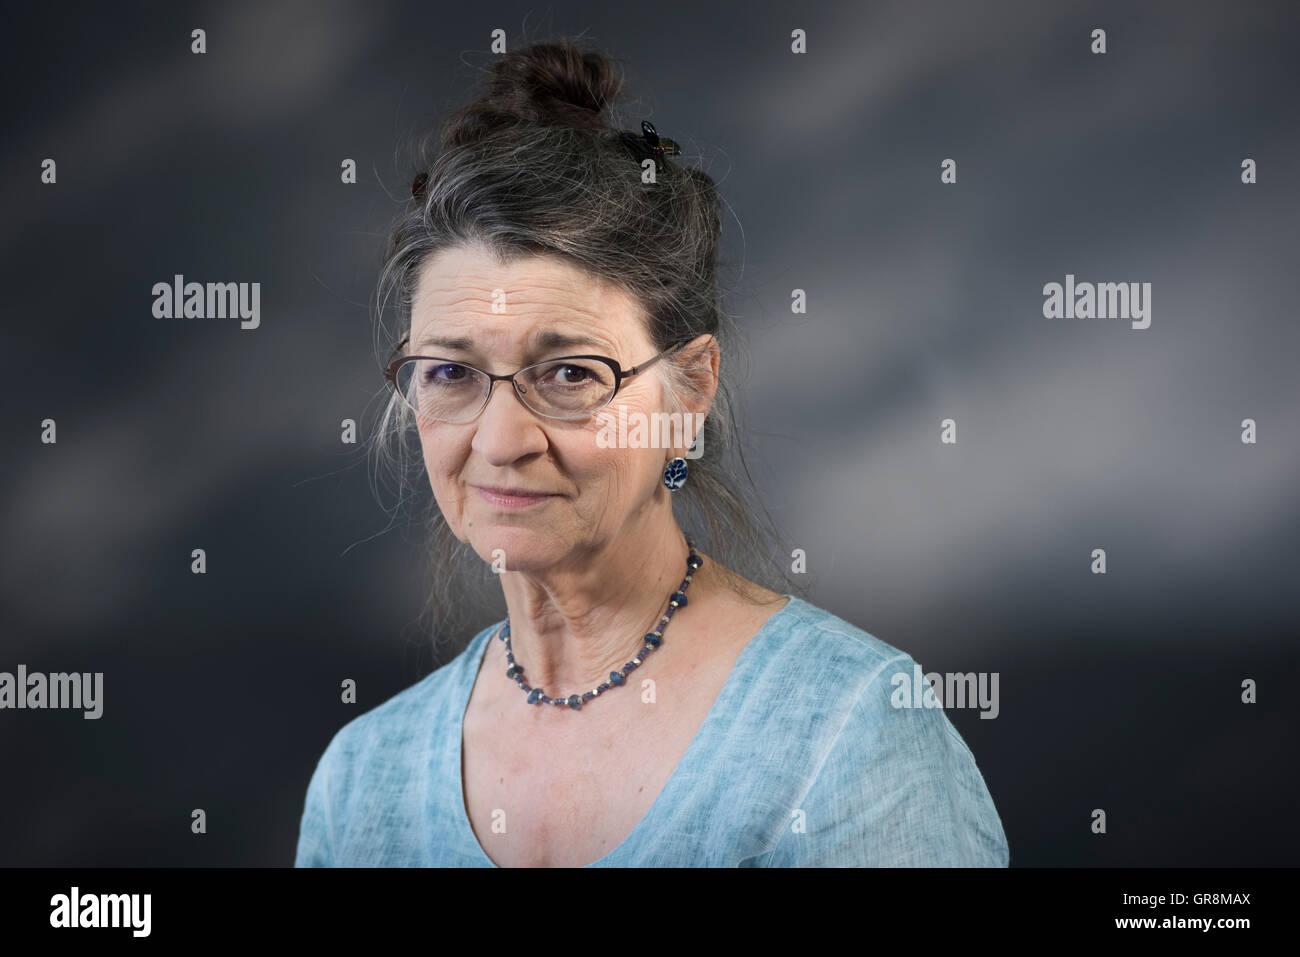 British novelist, short story writer, historian and mythographer Marina Warner. - Stock Image